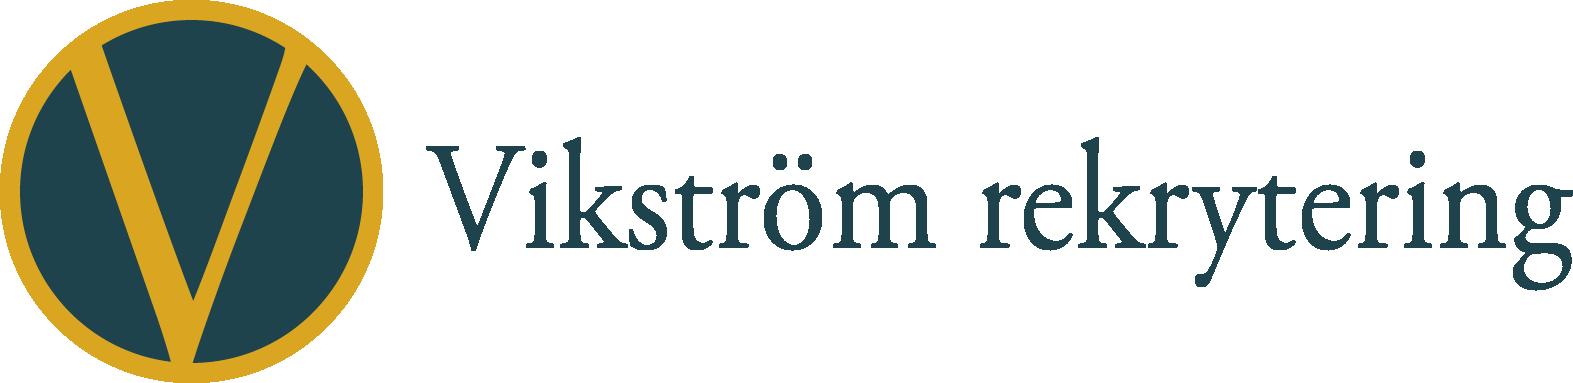 Vikström rekrytering logotyp